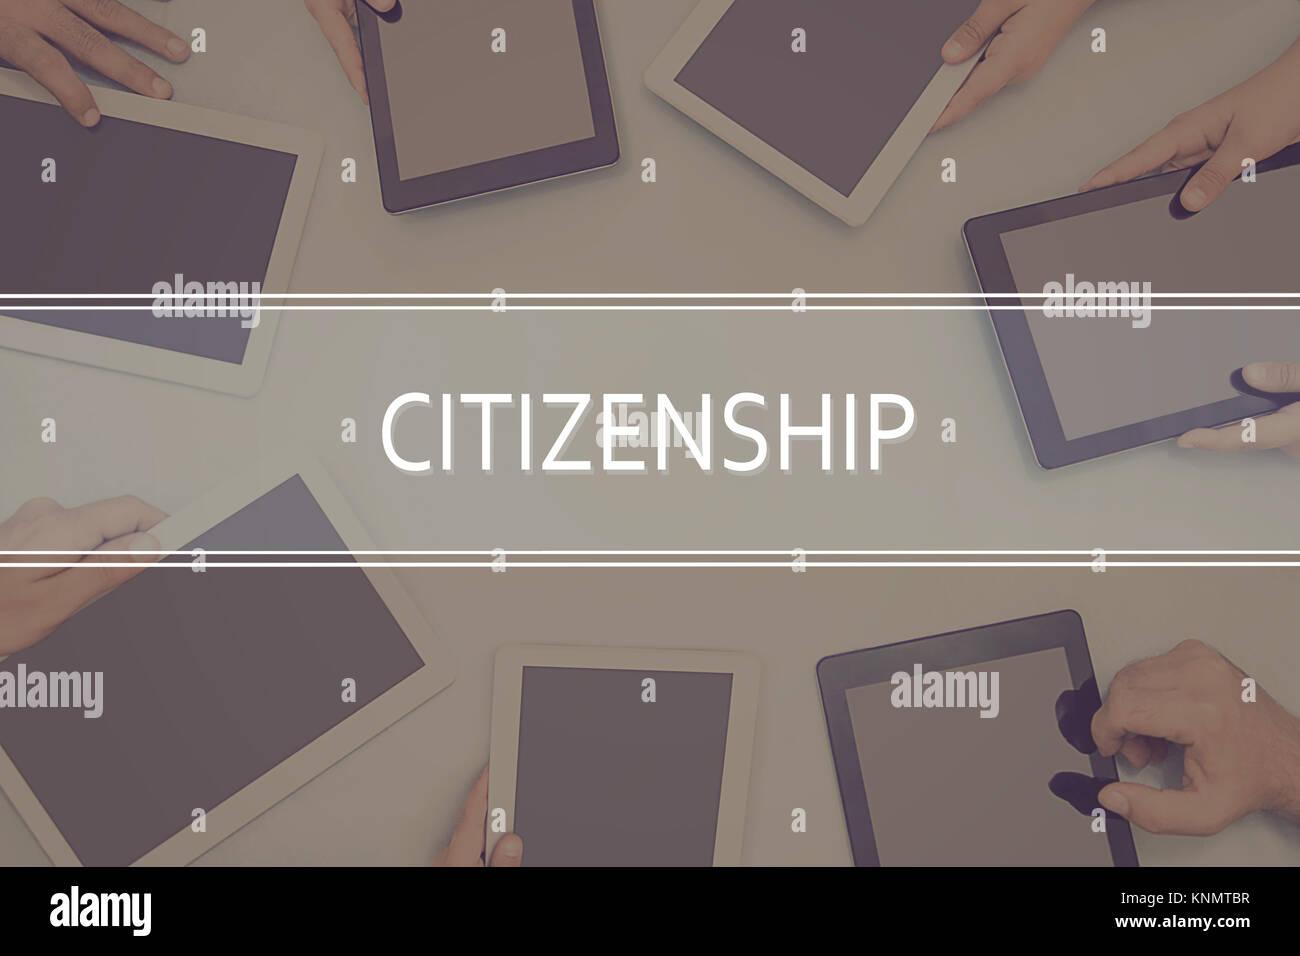 CITIZENSHIP CONCEPT Business Concept. - Stock Image